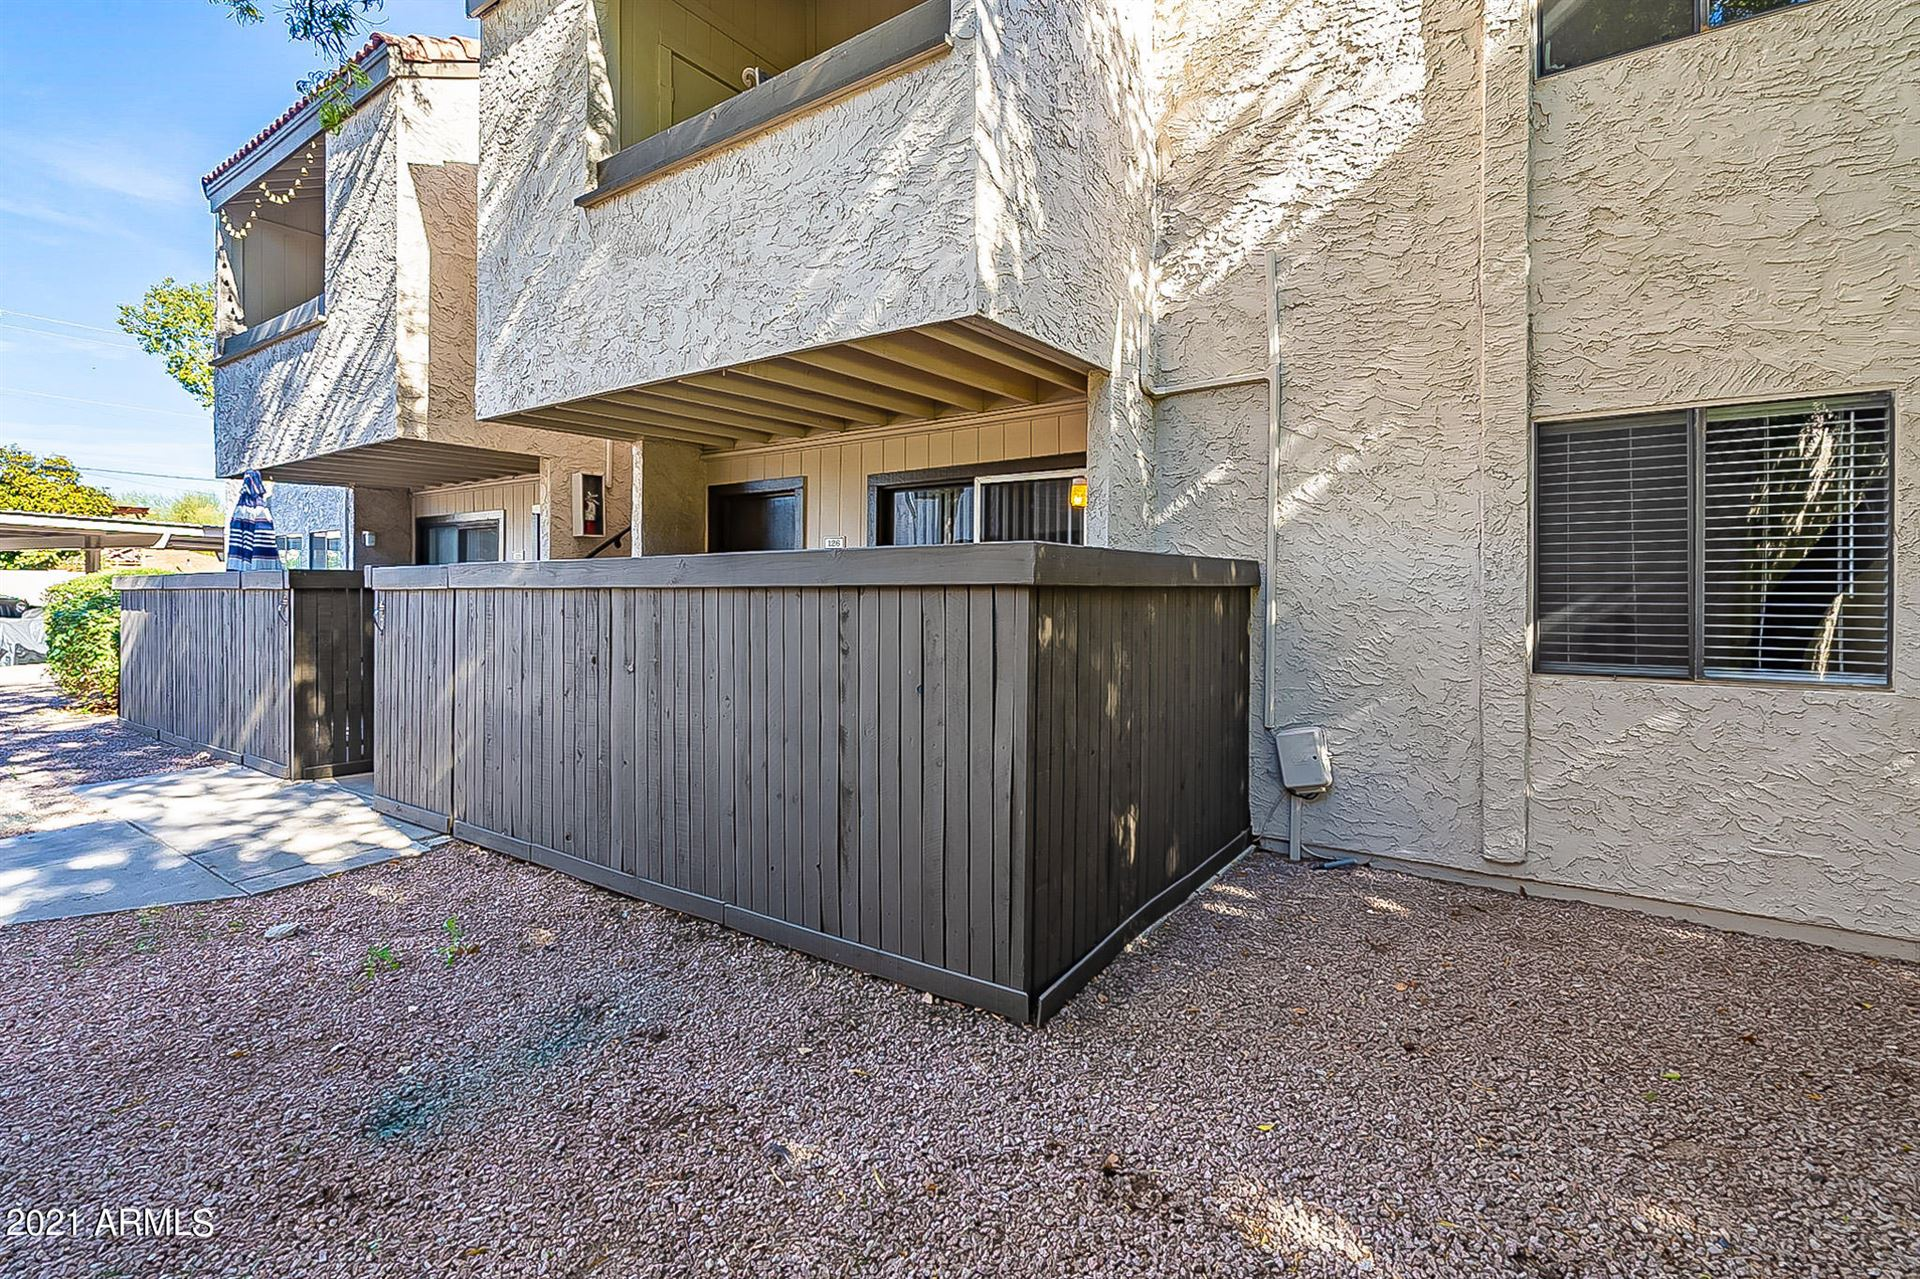 2938 N 61ST Place #126, Scottsdale, AZ 85251 - MLS#: 6182241